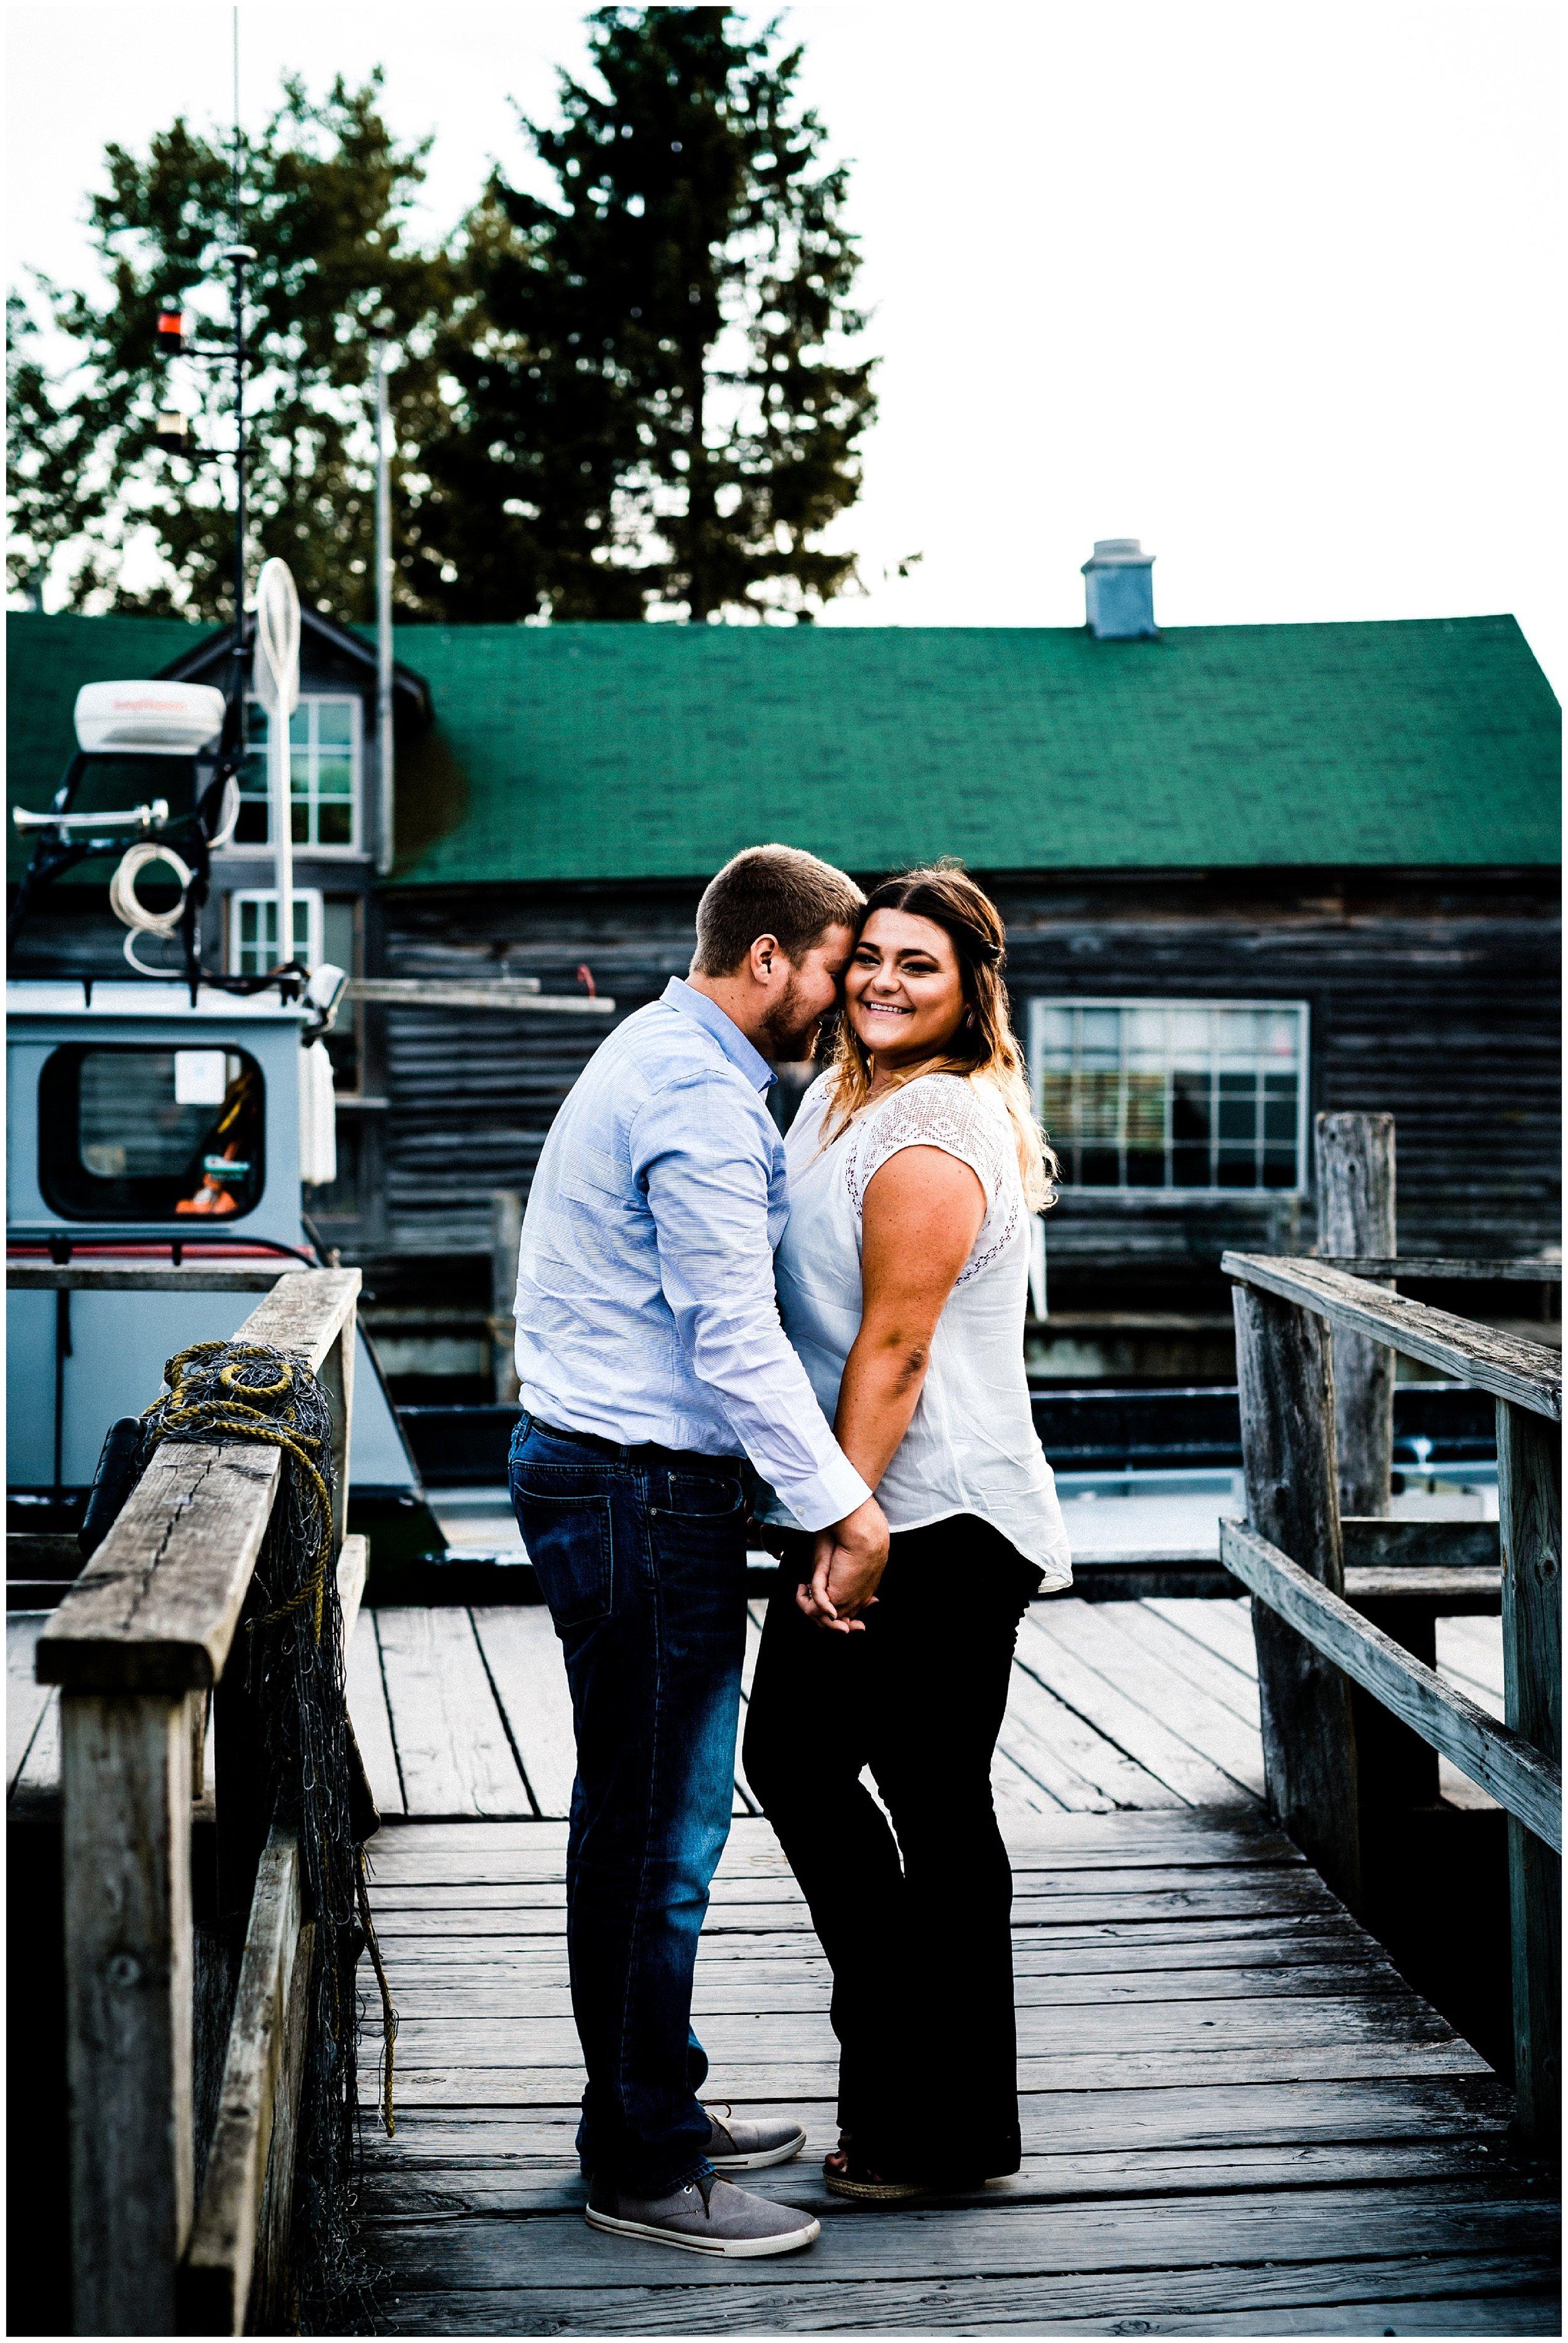 Kyle + Emily | Engaged #kyleepaigephotography_0490.jpg